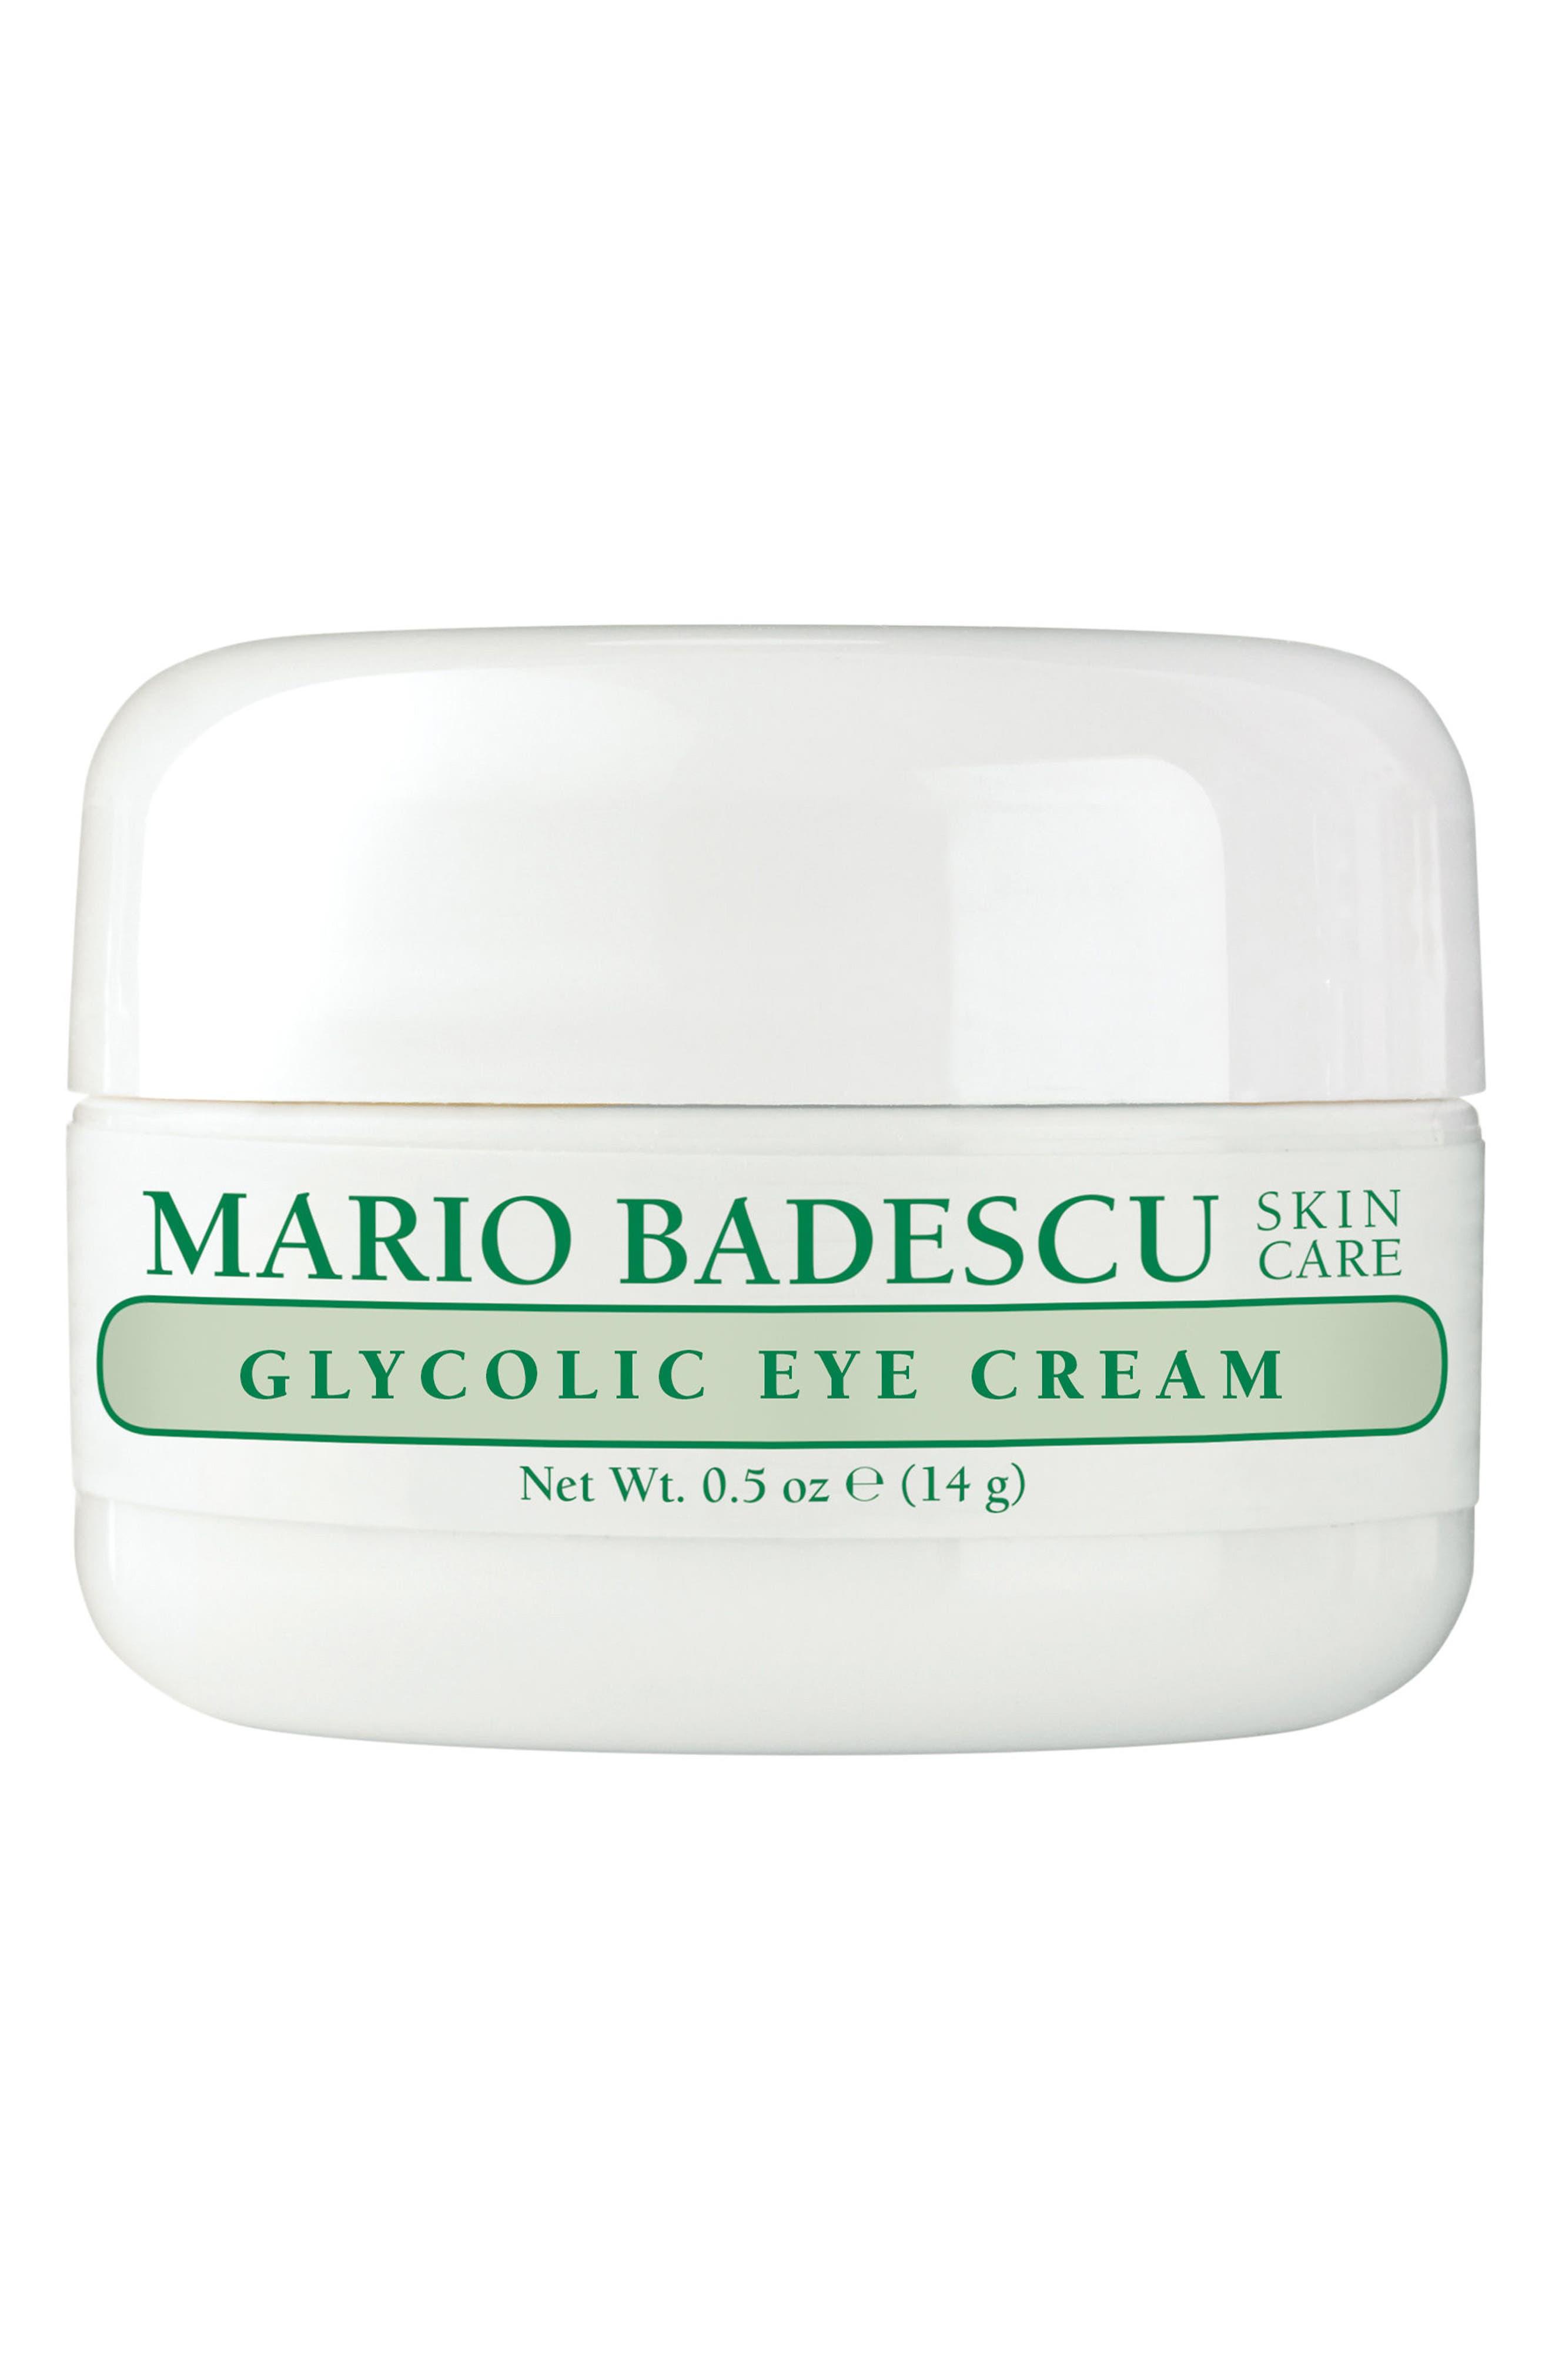 Glycolic Eye Cream,                             Main thumbnail 1, color,                             NO COLOR